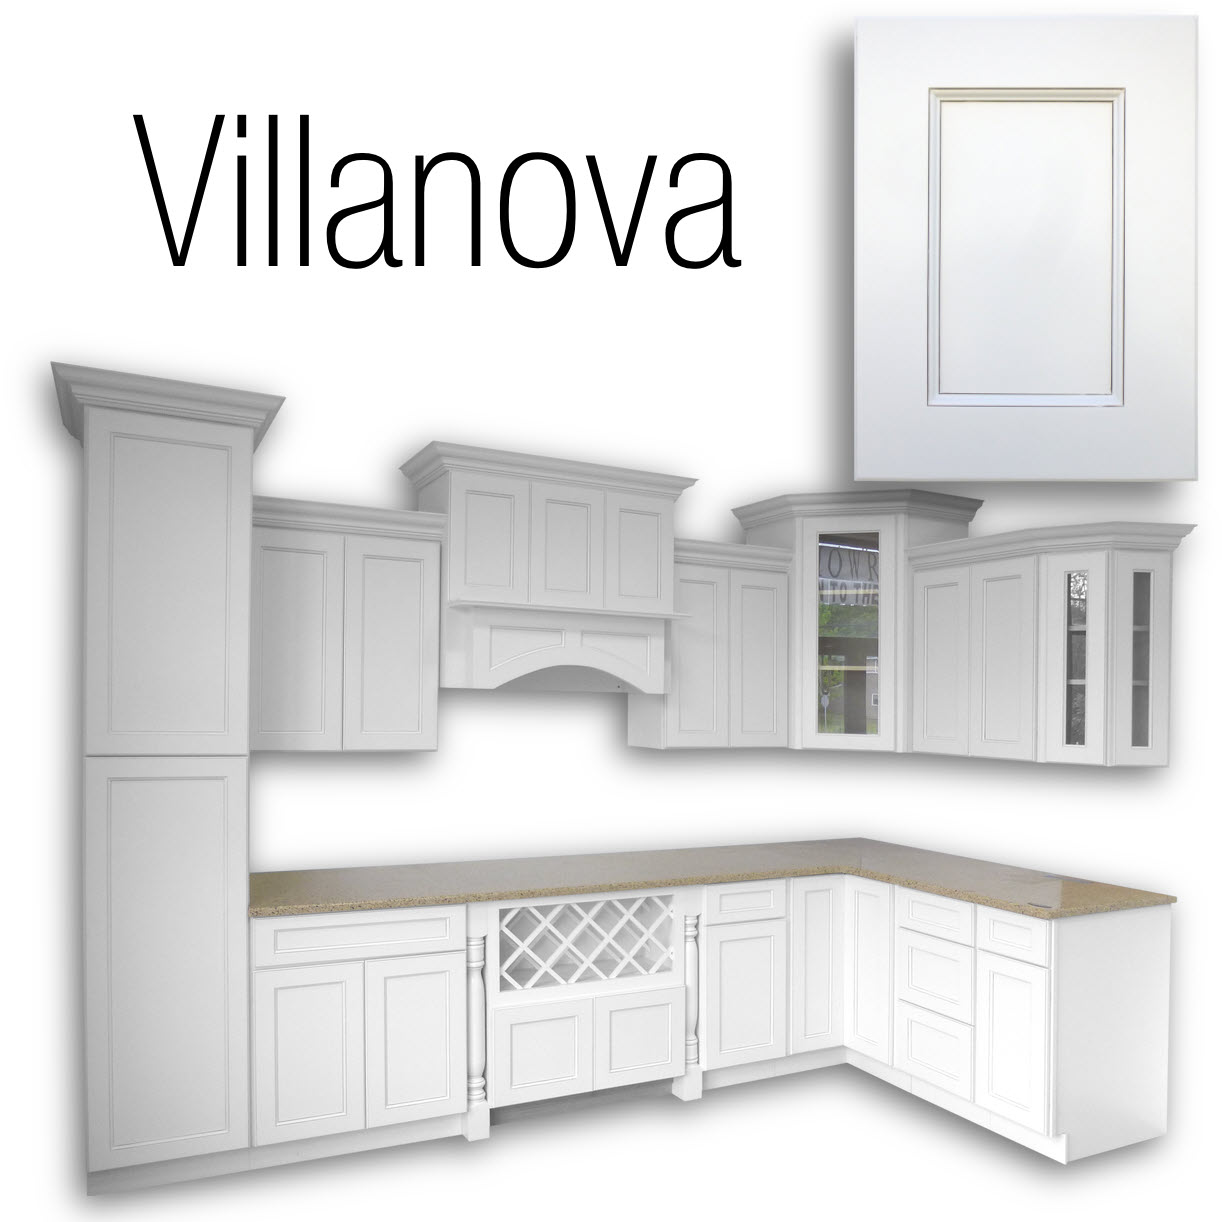 Villanova Cabinets: - Home Surplus